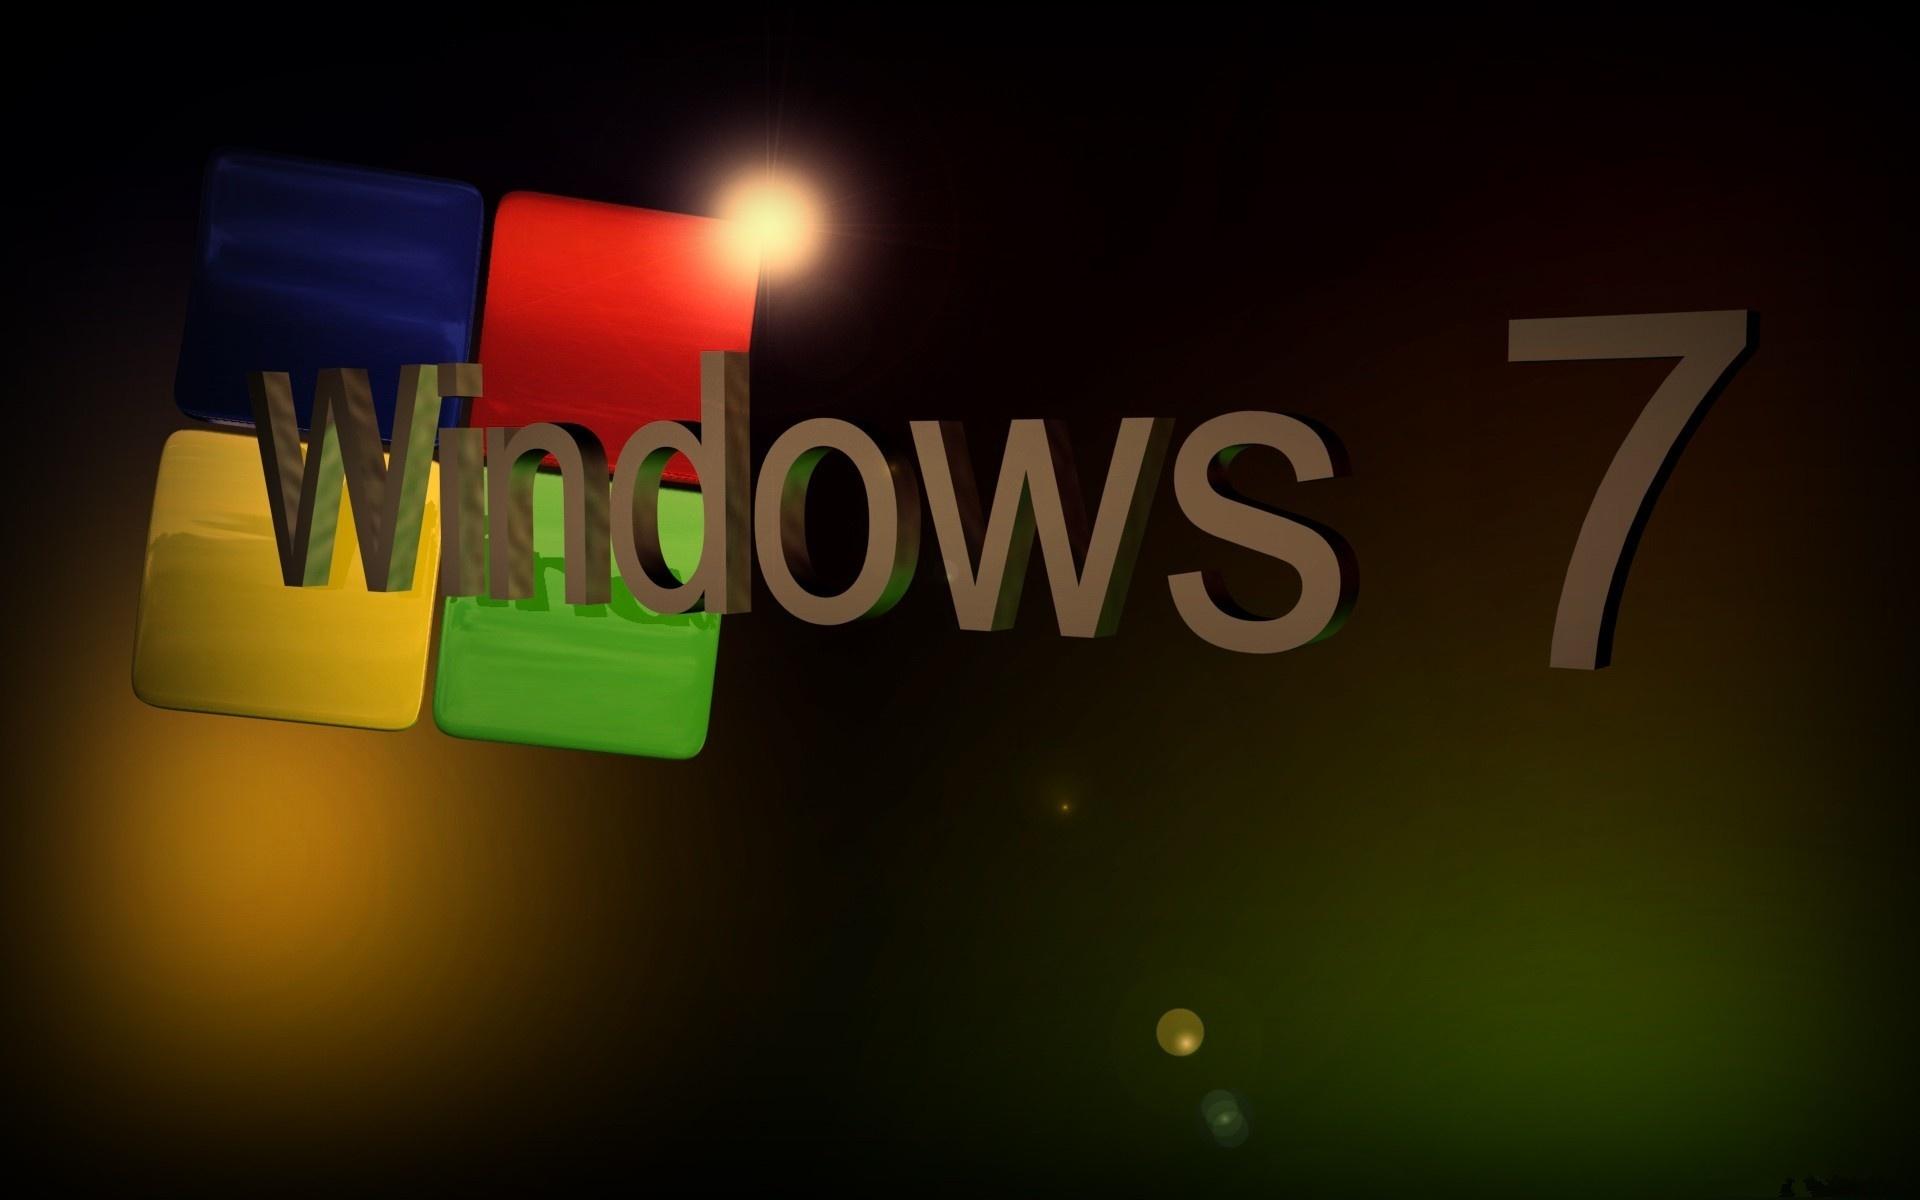 Windows 7 Hd Wallpaper - Fondos De Pantallas Hd Windows , HD Wallpaper & Backgrounds